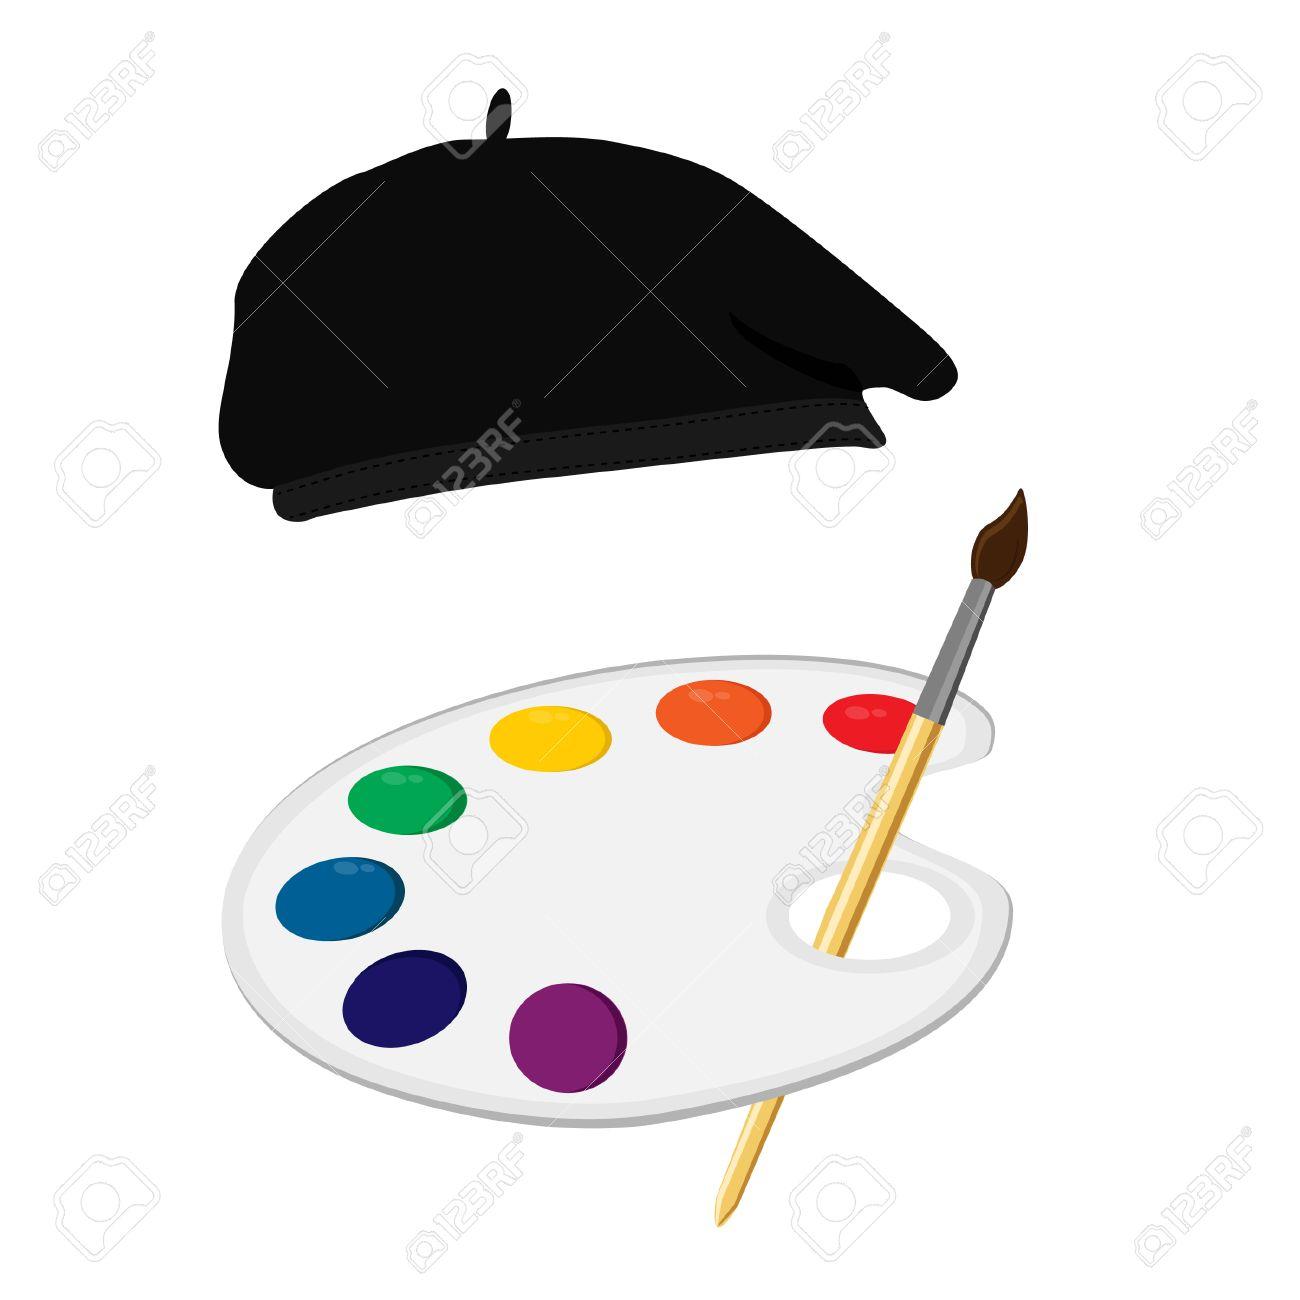 cc3ac9f48c77d Foto de archivo - Vector ilustración símbolo de pintor o concepto. Sombrero  de pintor